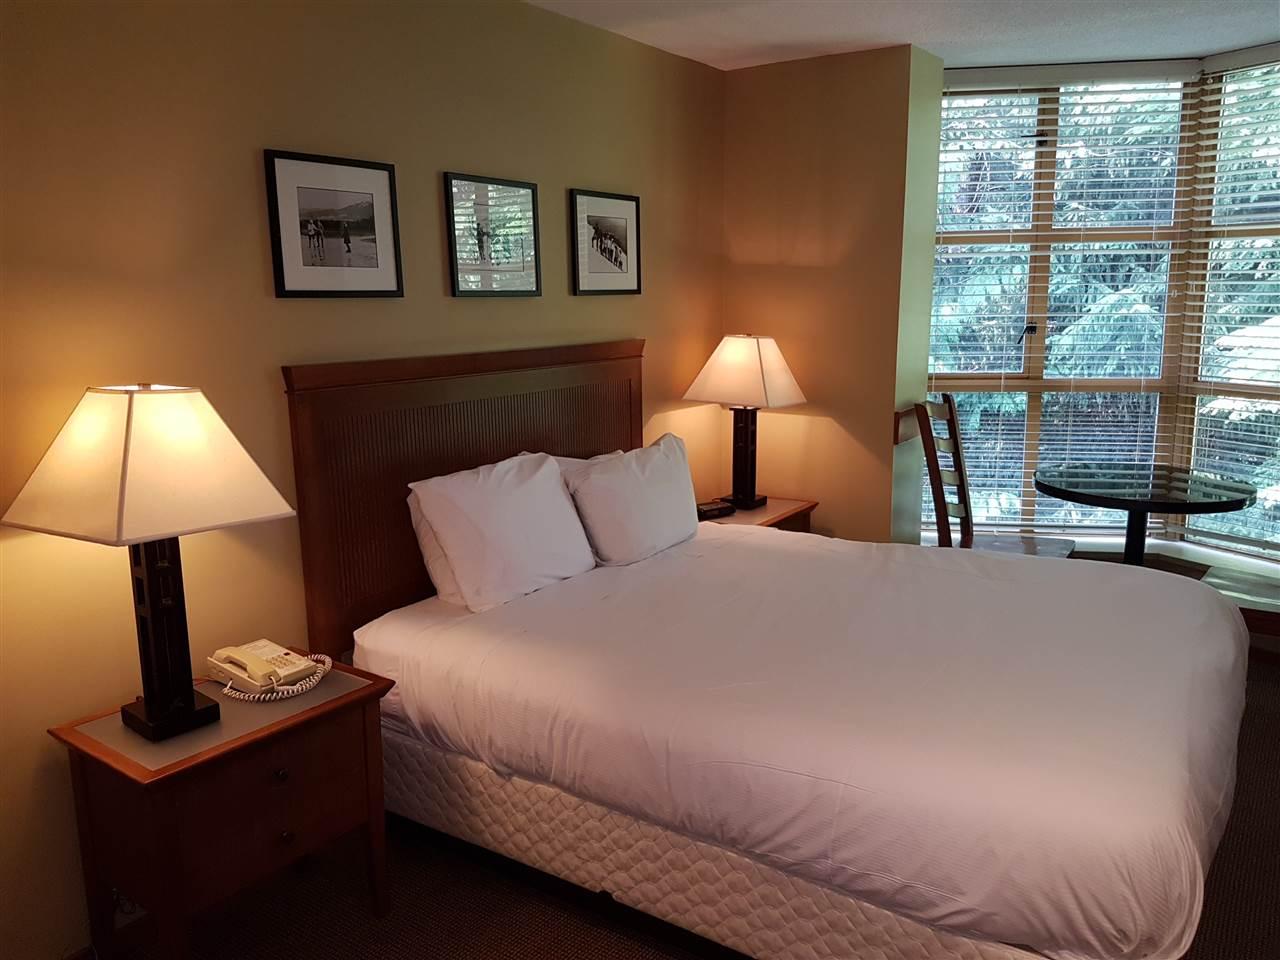 Condo Apartment at 325 4315 NORTHLANDS BOULEVARD, Unit 325, Whistler, British Columbia. Image 2